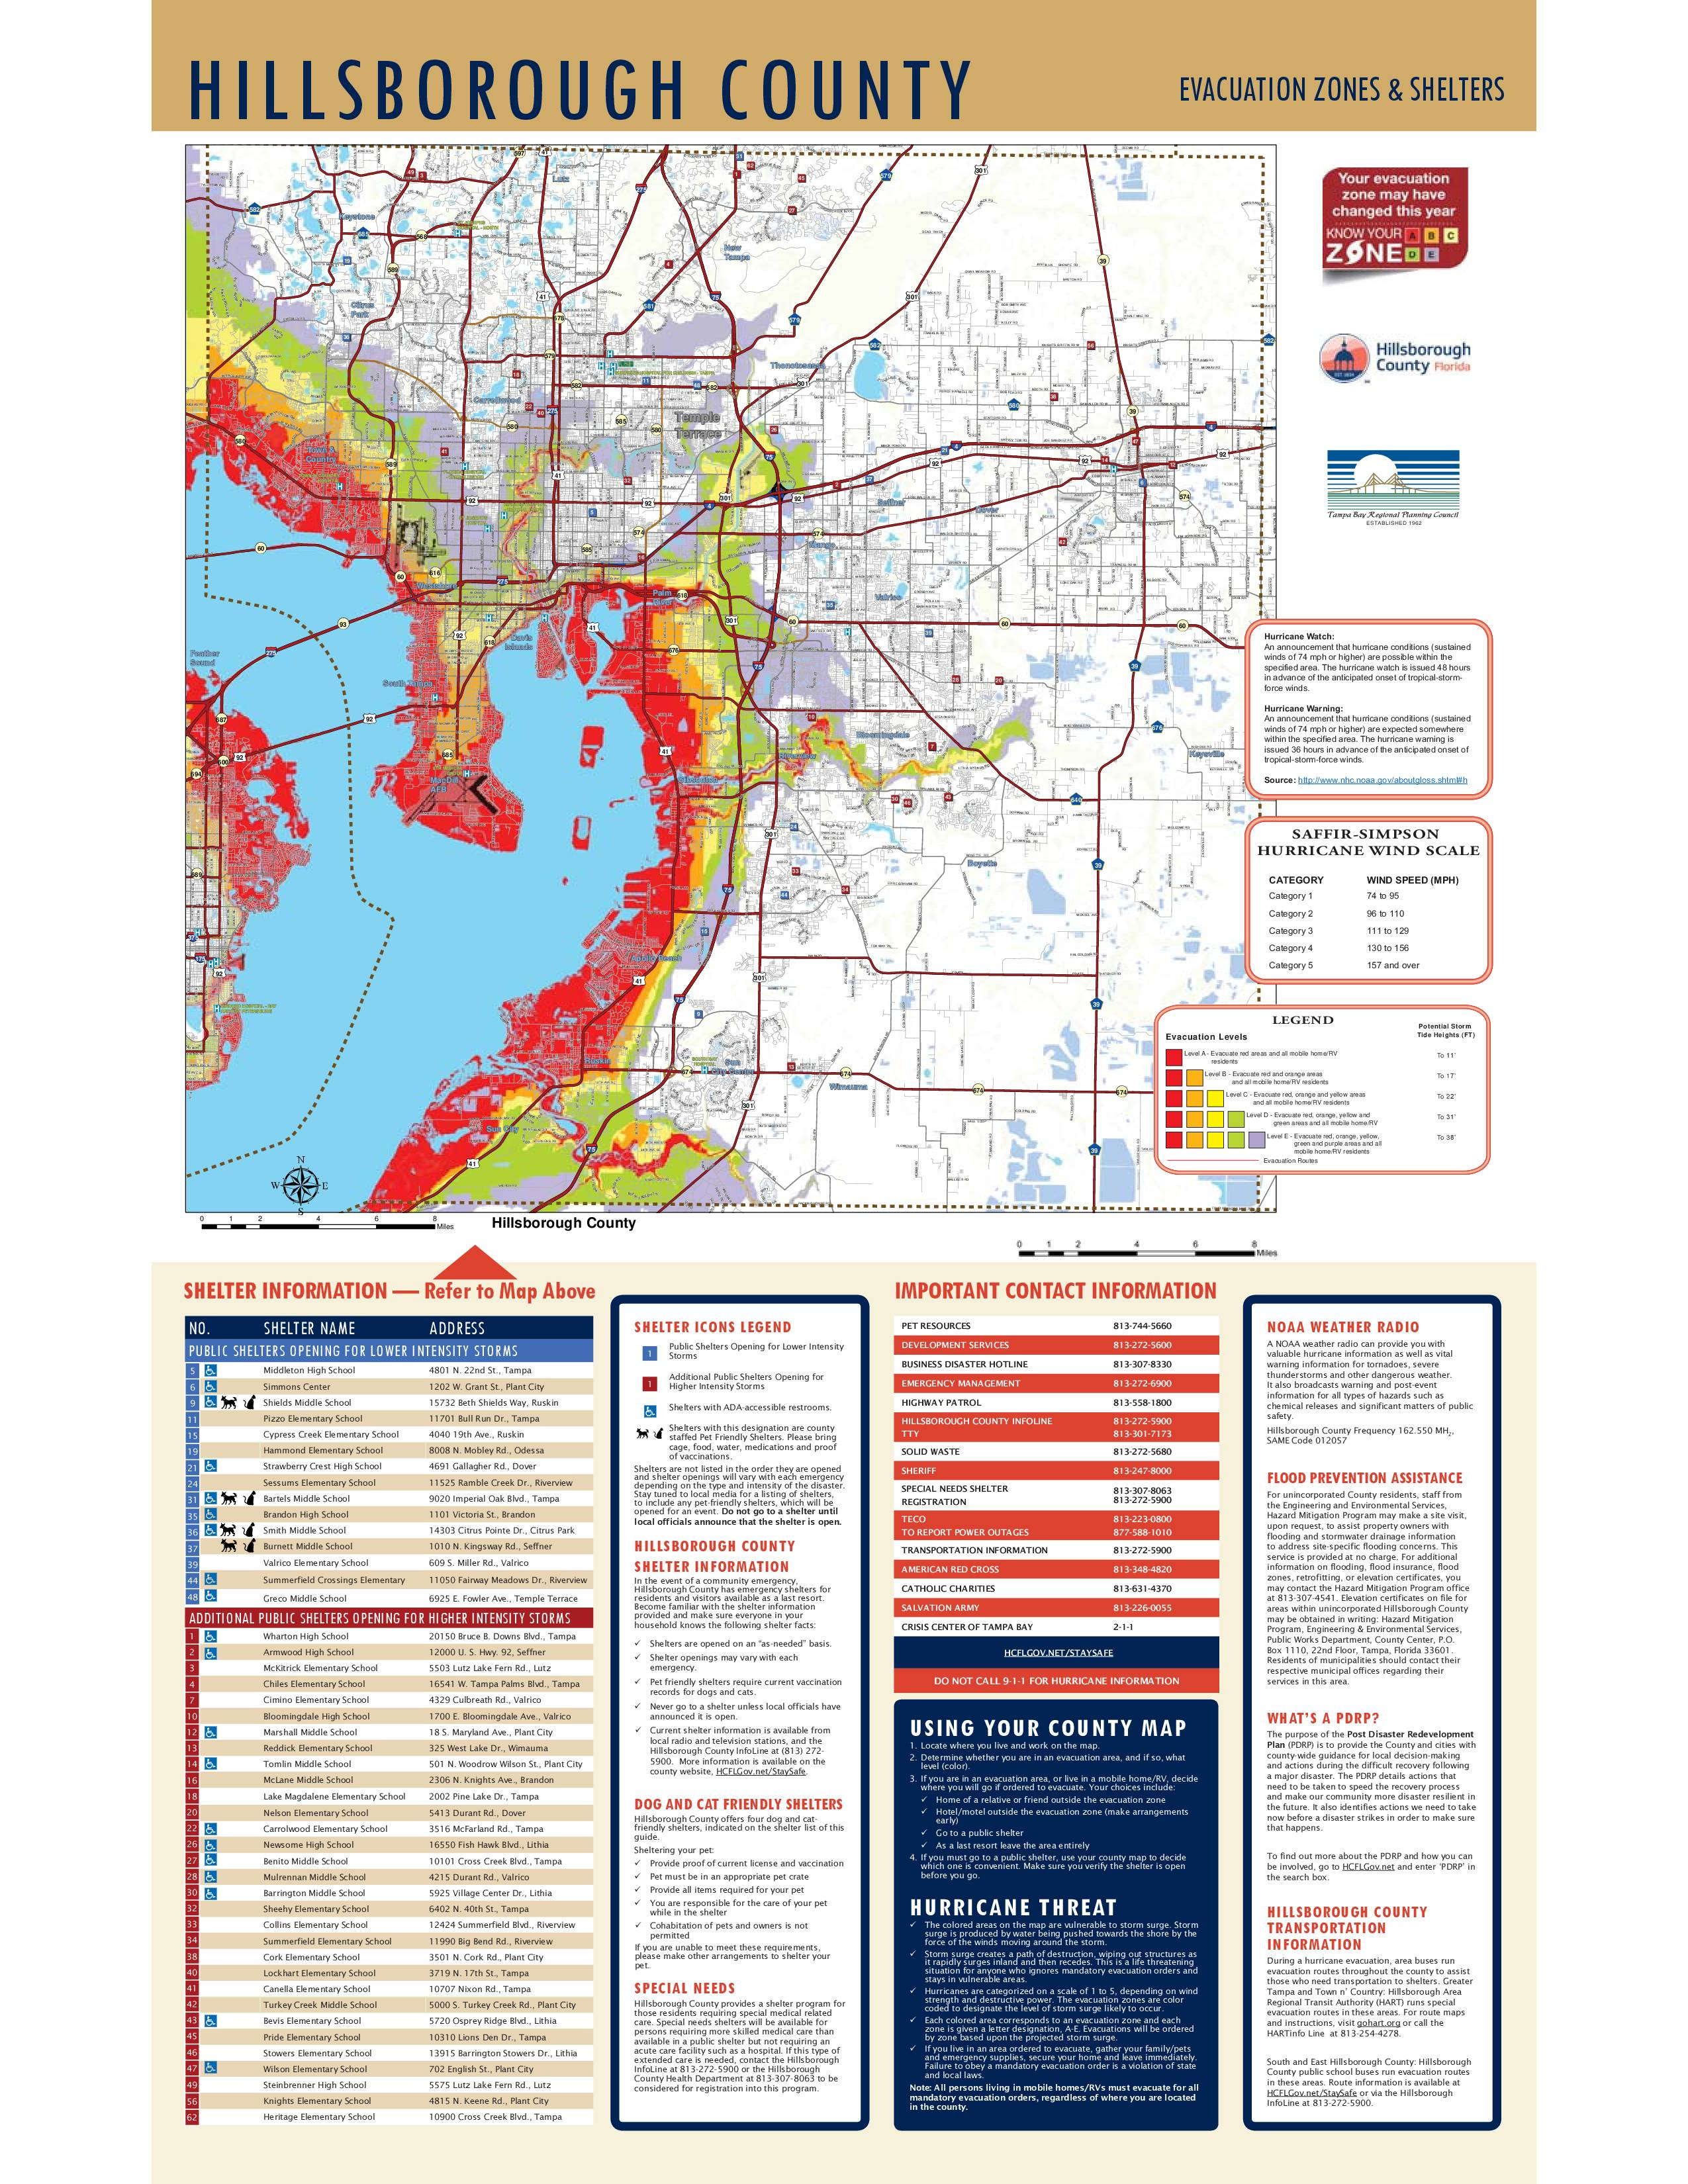 Hillsborough County Evacuation Routes for Hurricane Irma